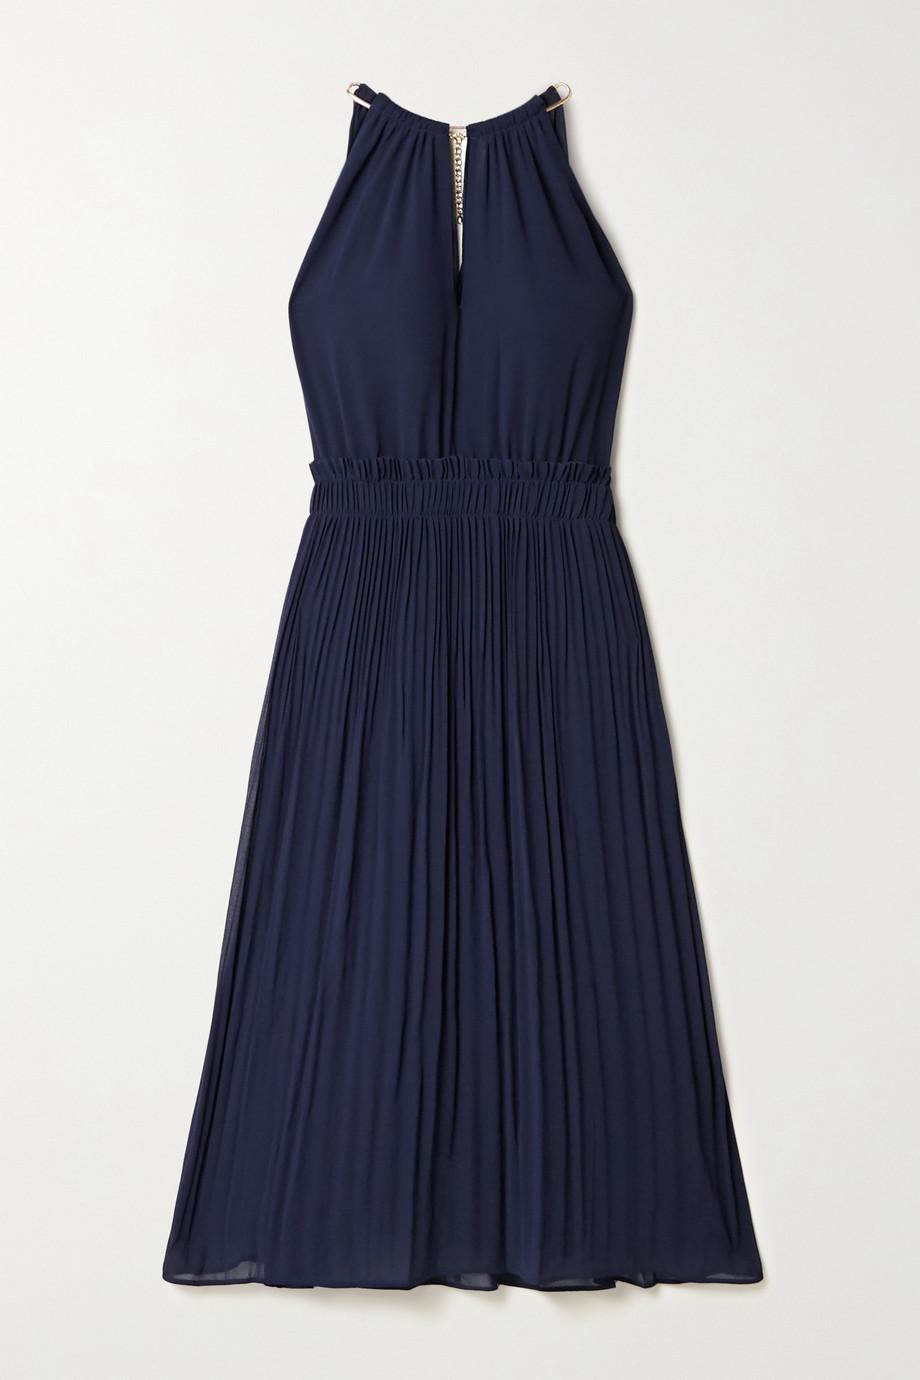 MICHAEL Michael Kors Hayden chain-embellished pleated georgette dress